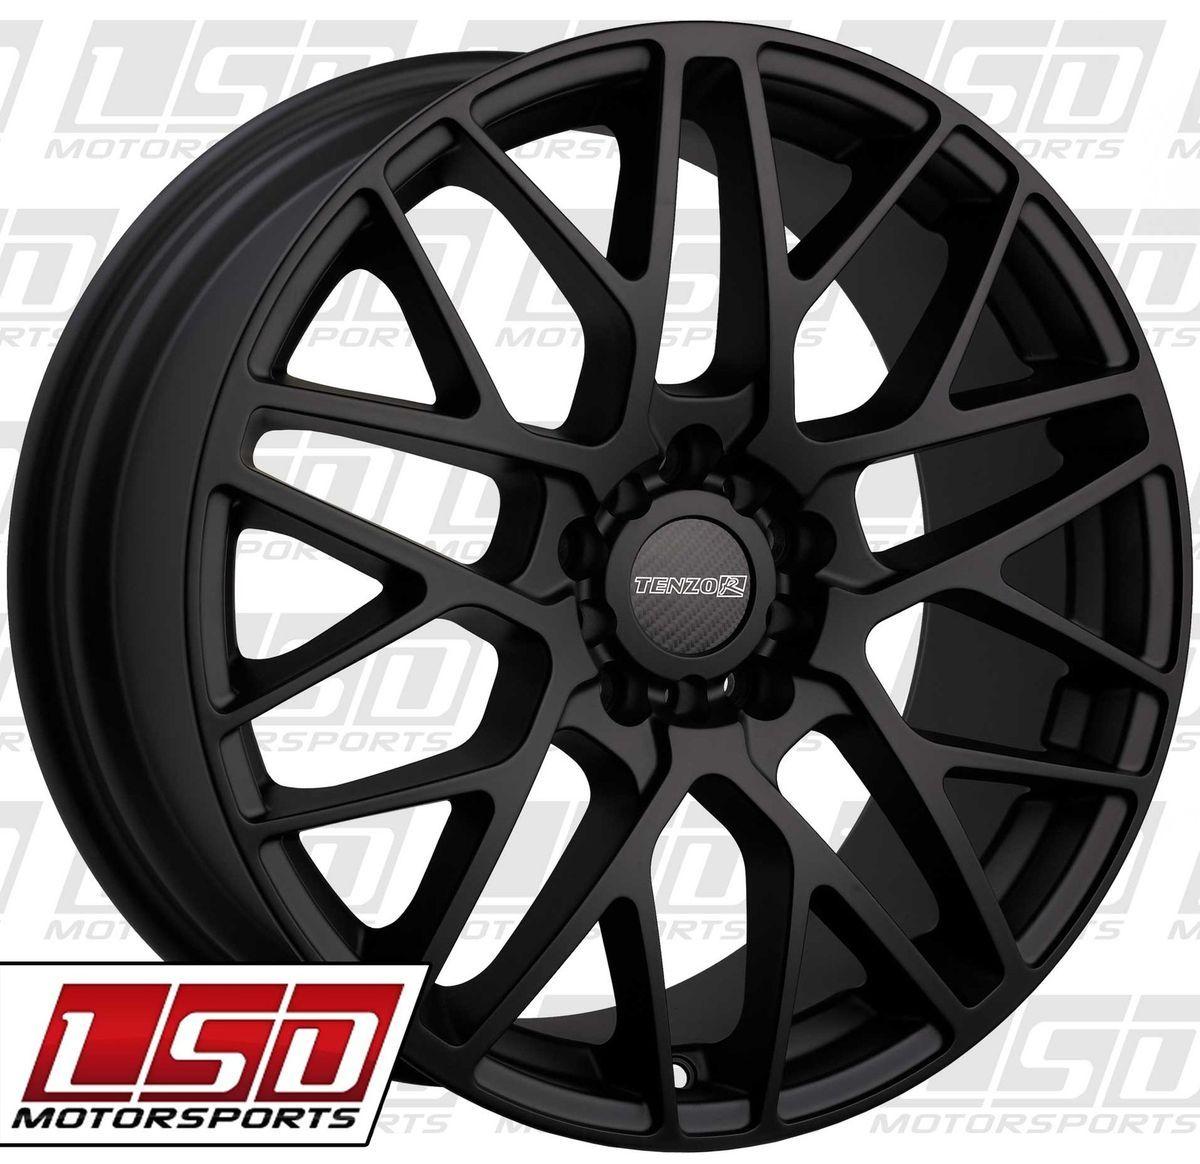 19 Tenzo R C10 Black Rims Wheels Nissan 350Z Infiniti G35 Coupe Ford